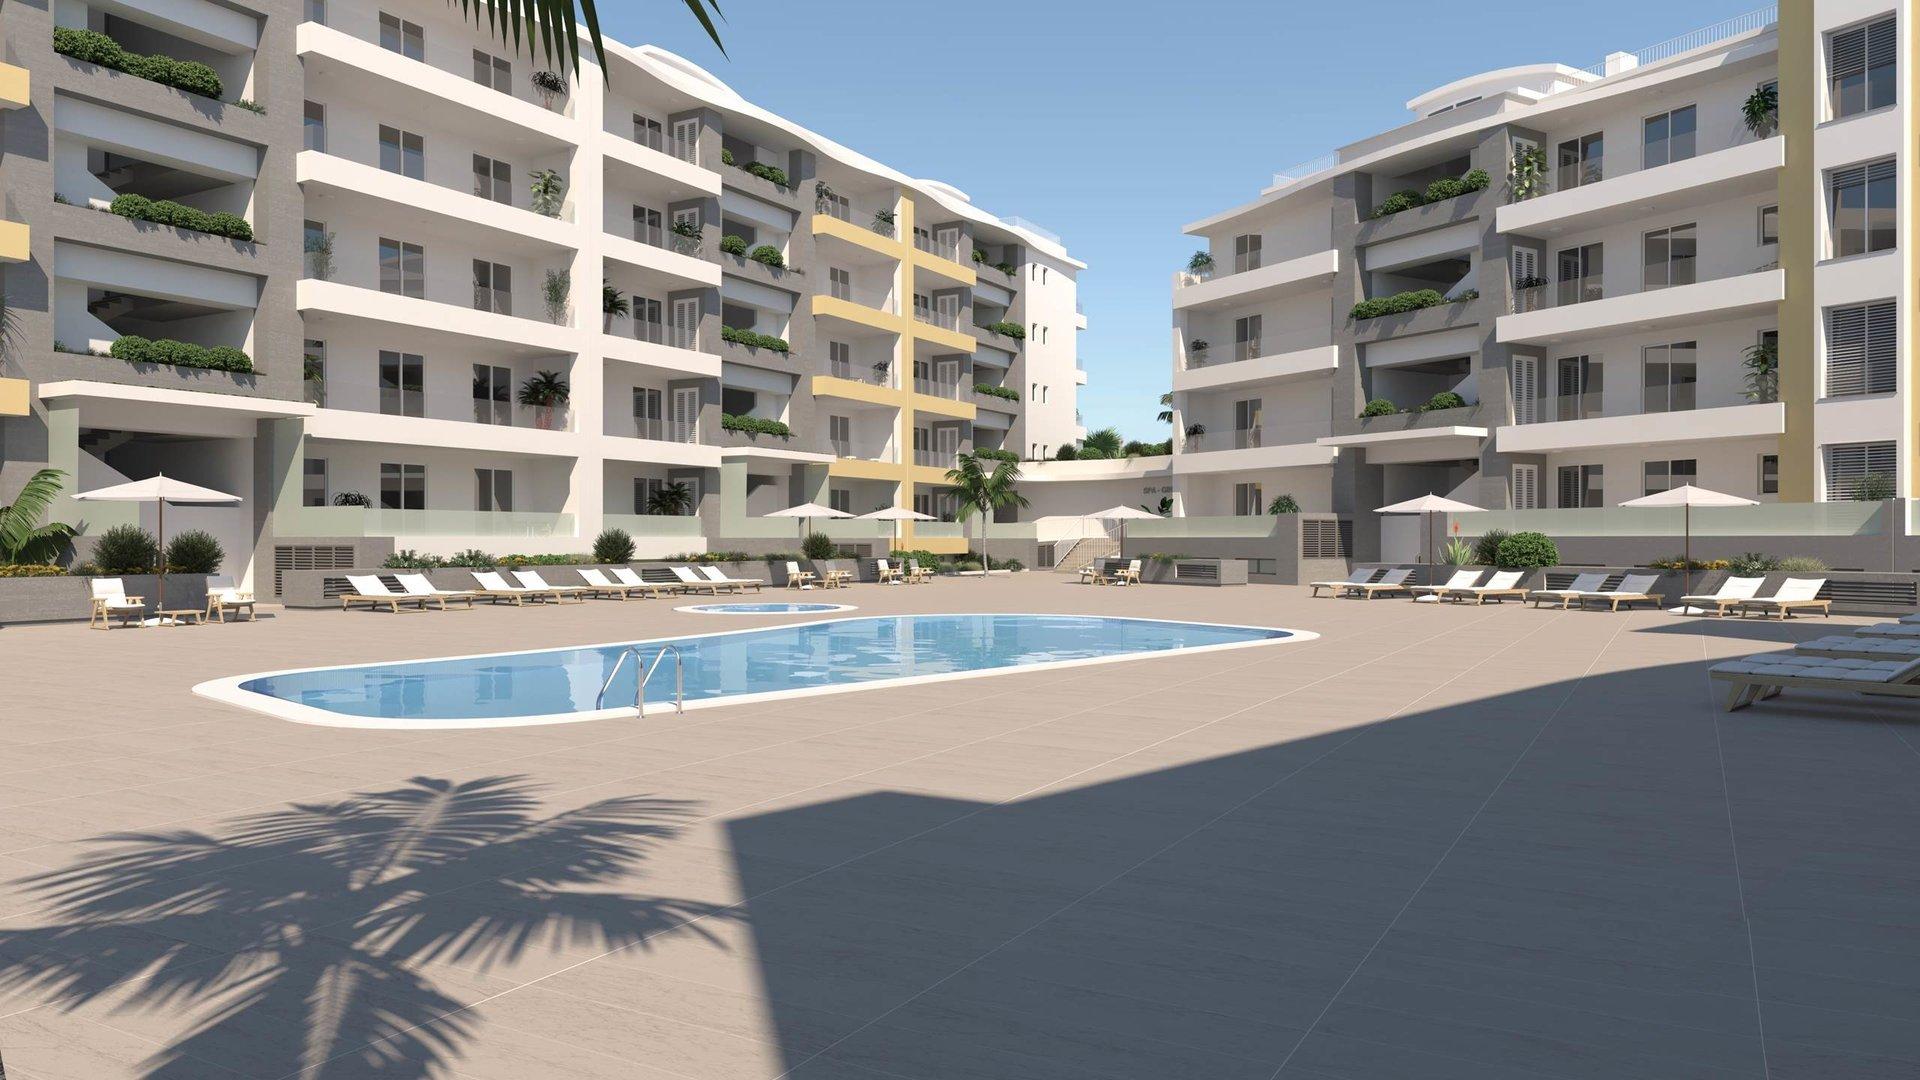 3 Bedroom Apartment Lagos, Western Algarve Ref: GA308C